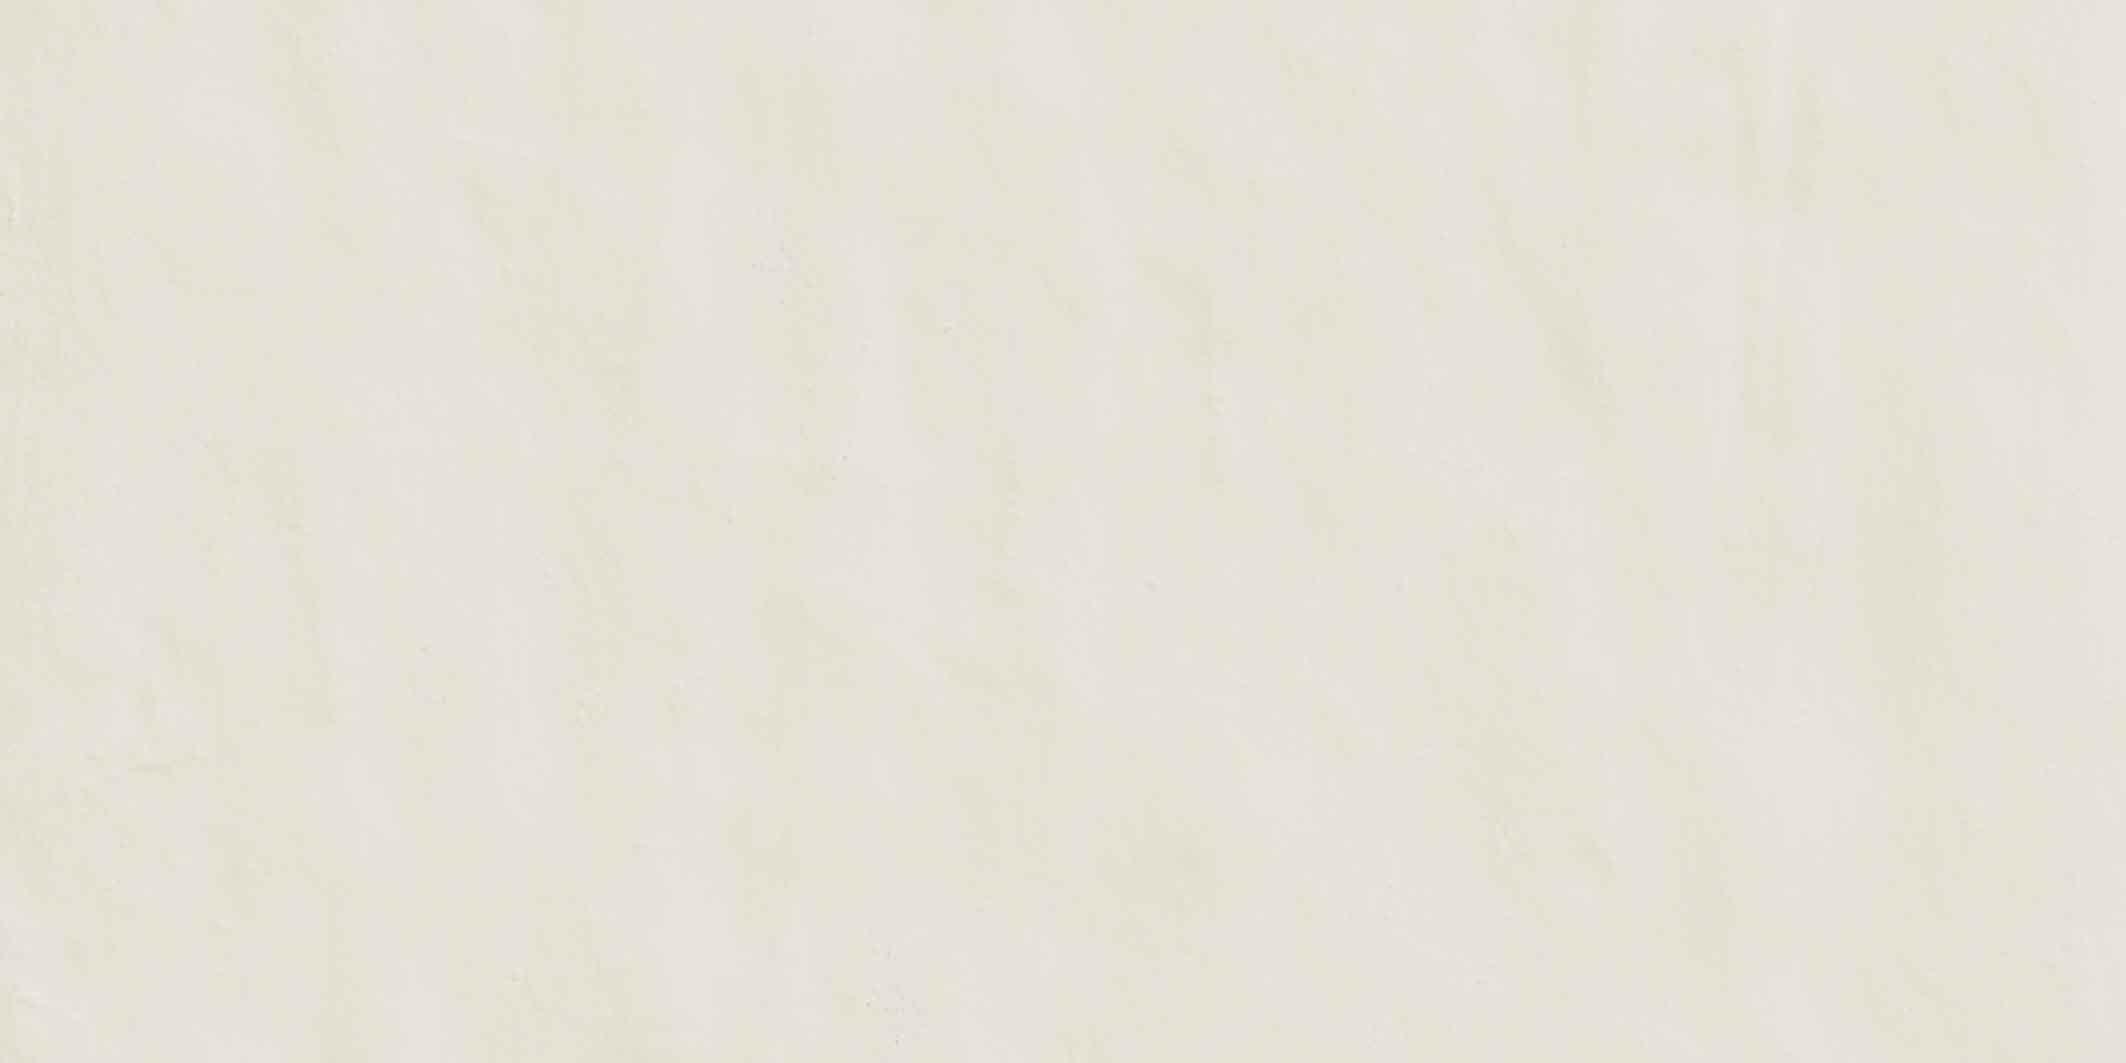 Neutra 6.0 Bianco 01 Grip 10mm 40 x 80